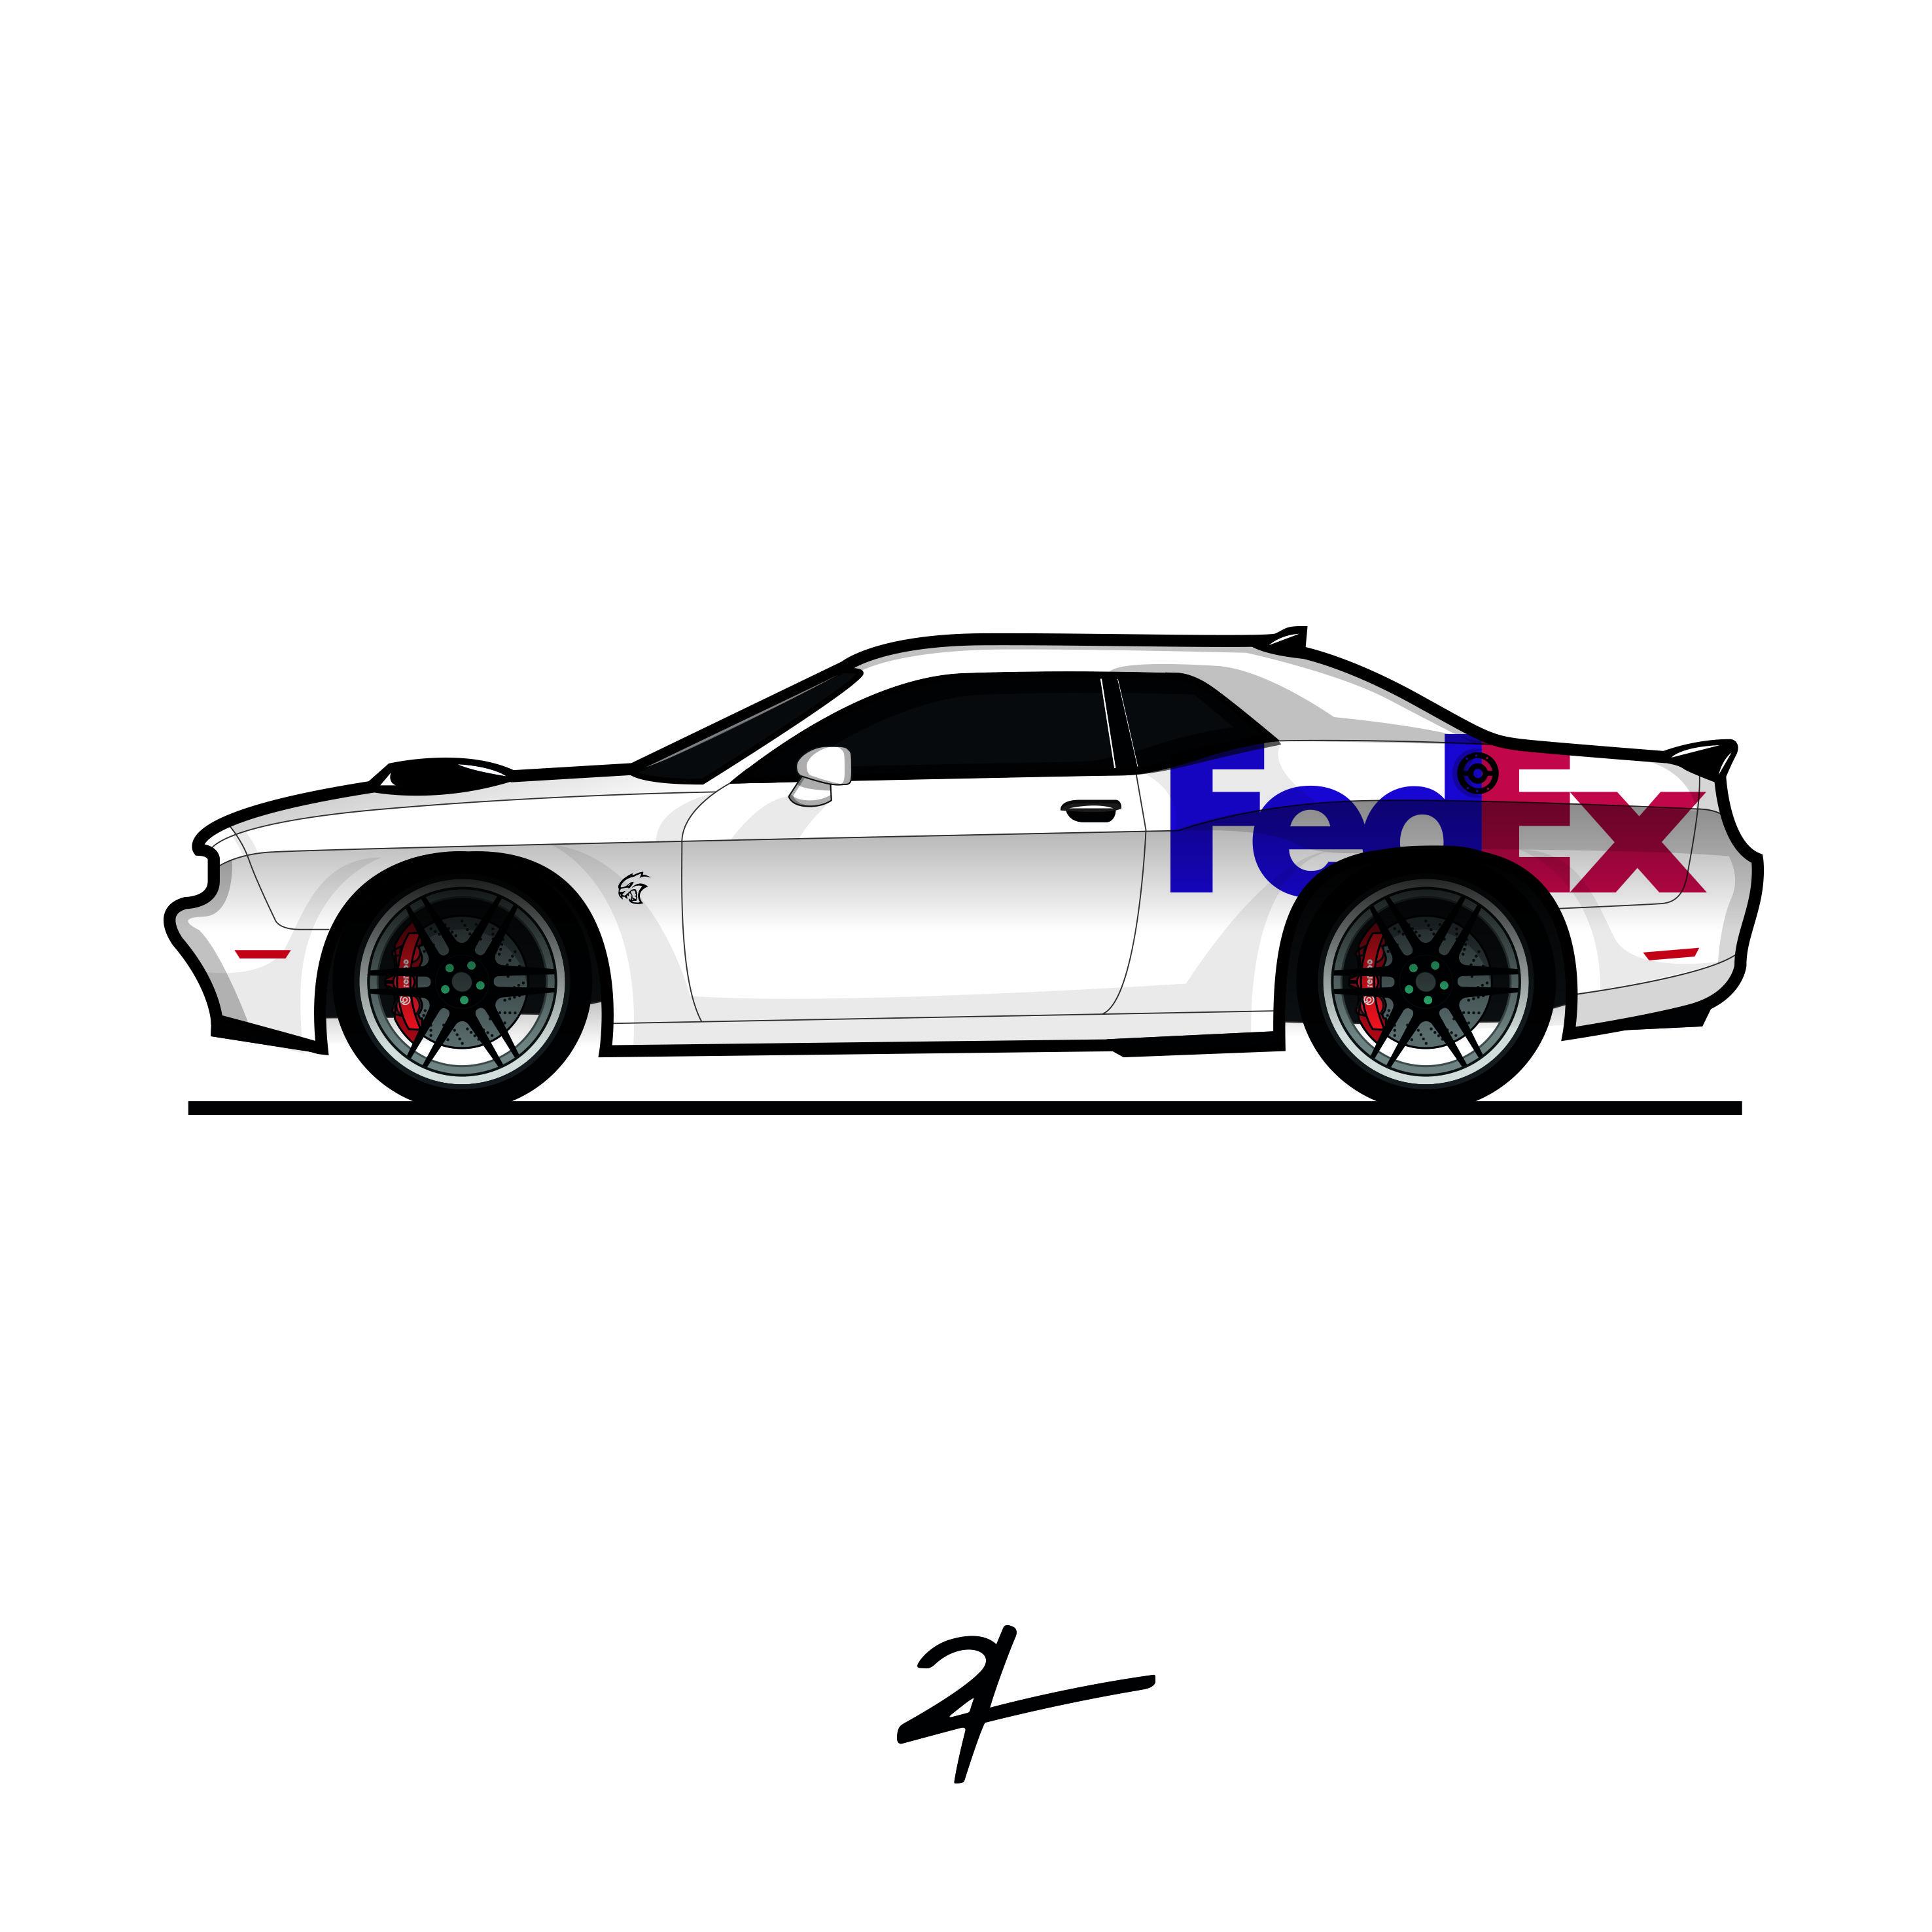 Streetwear Hypebeast Graphicdesign Logo Artwork Fedex